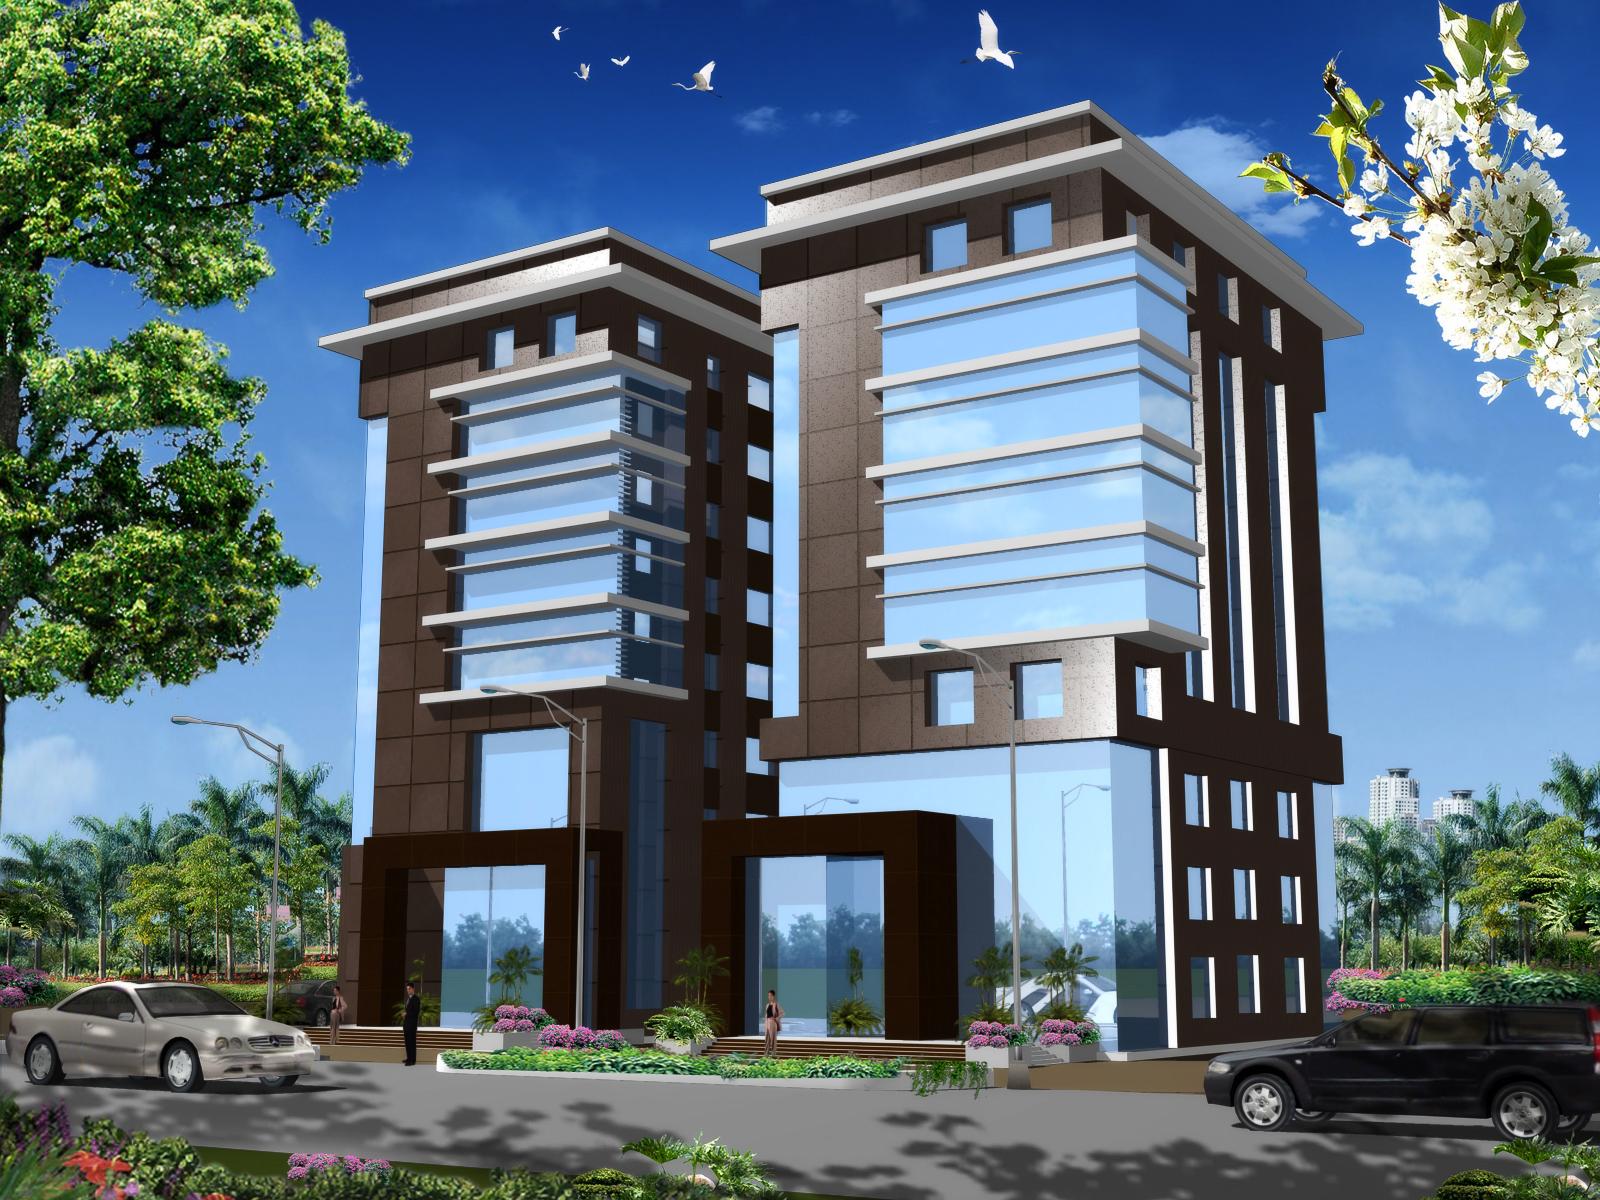 commercial building cad 3d model free download